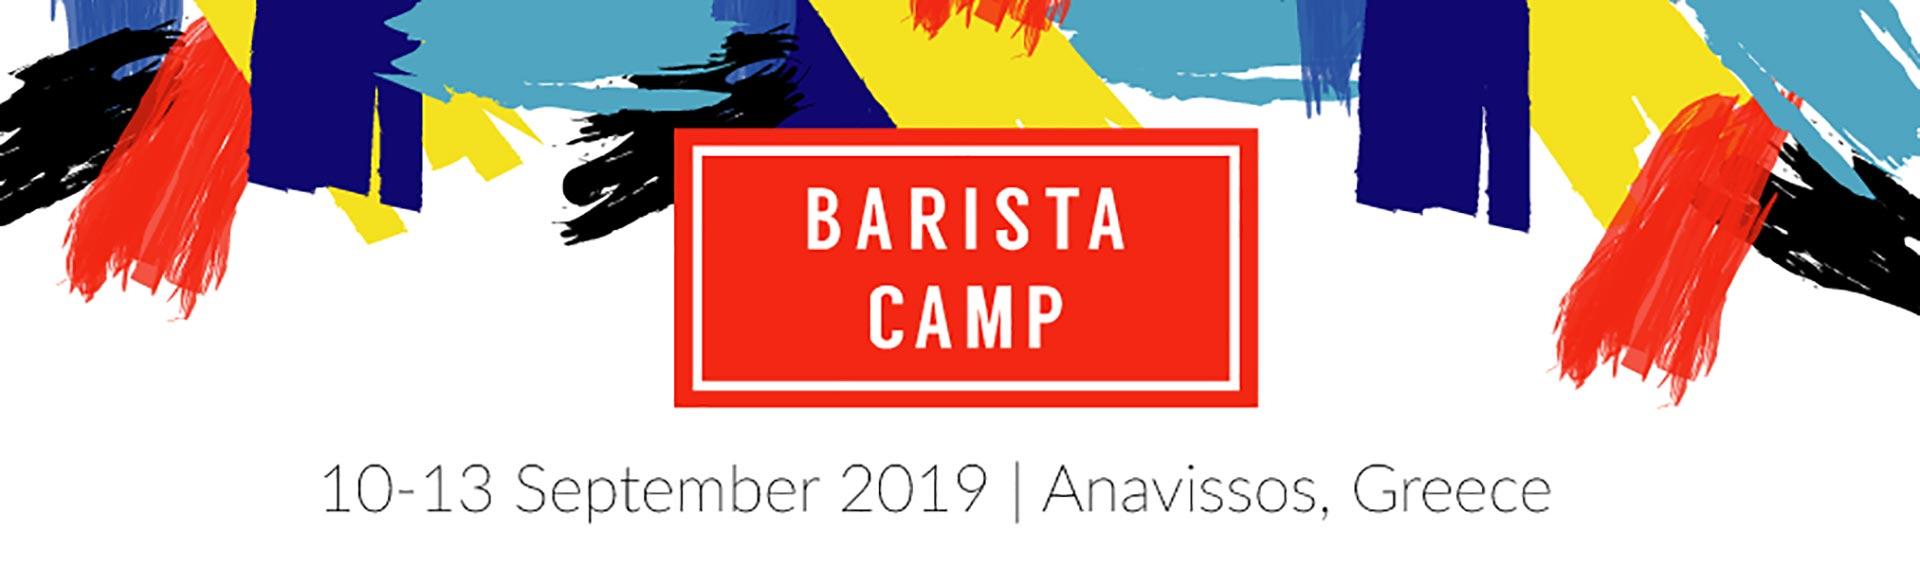 Kaffee-Events, Festival und Kalender: Barista Champ Greece. CafCaf – Kaffee & Blog, Kaffeeblog